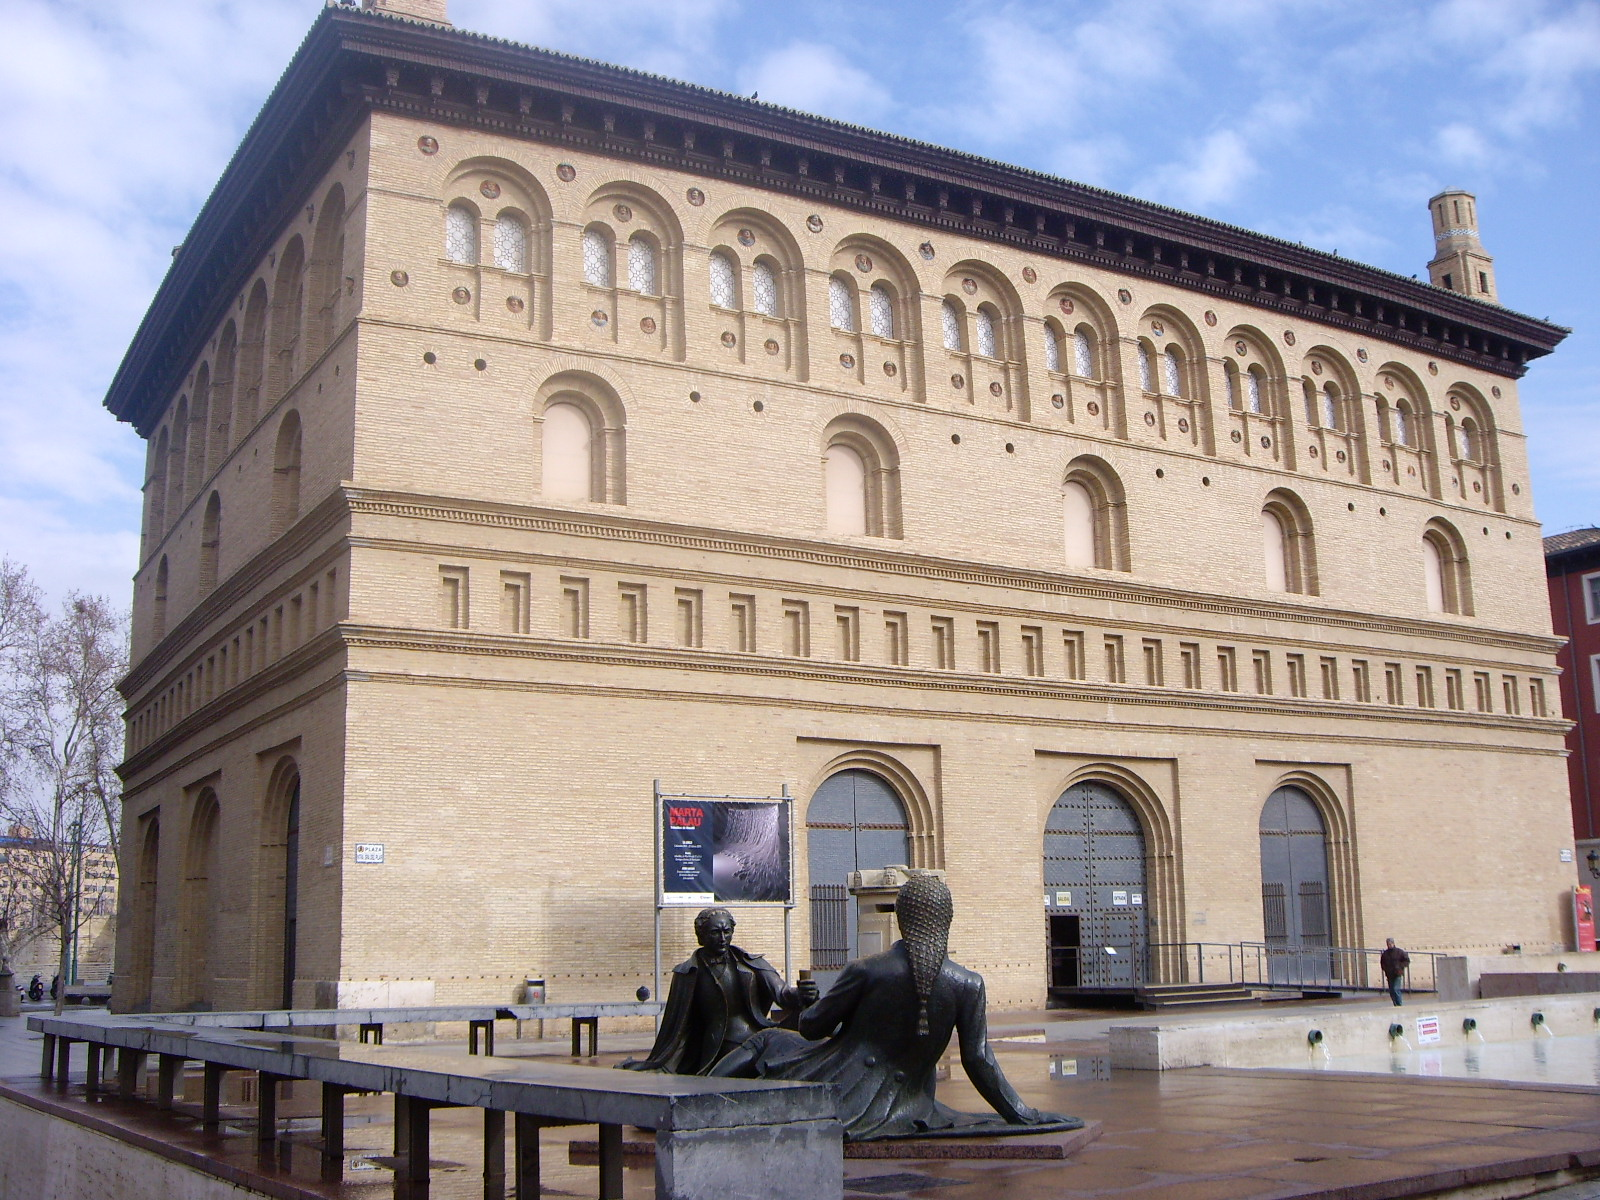 Pilar Square, Saragossa (Plaza del Pilar de Zaragoza) - The best places in Spain